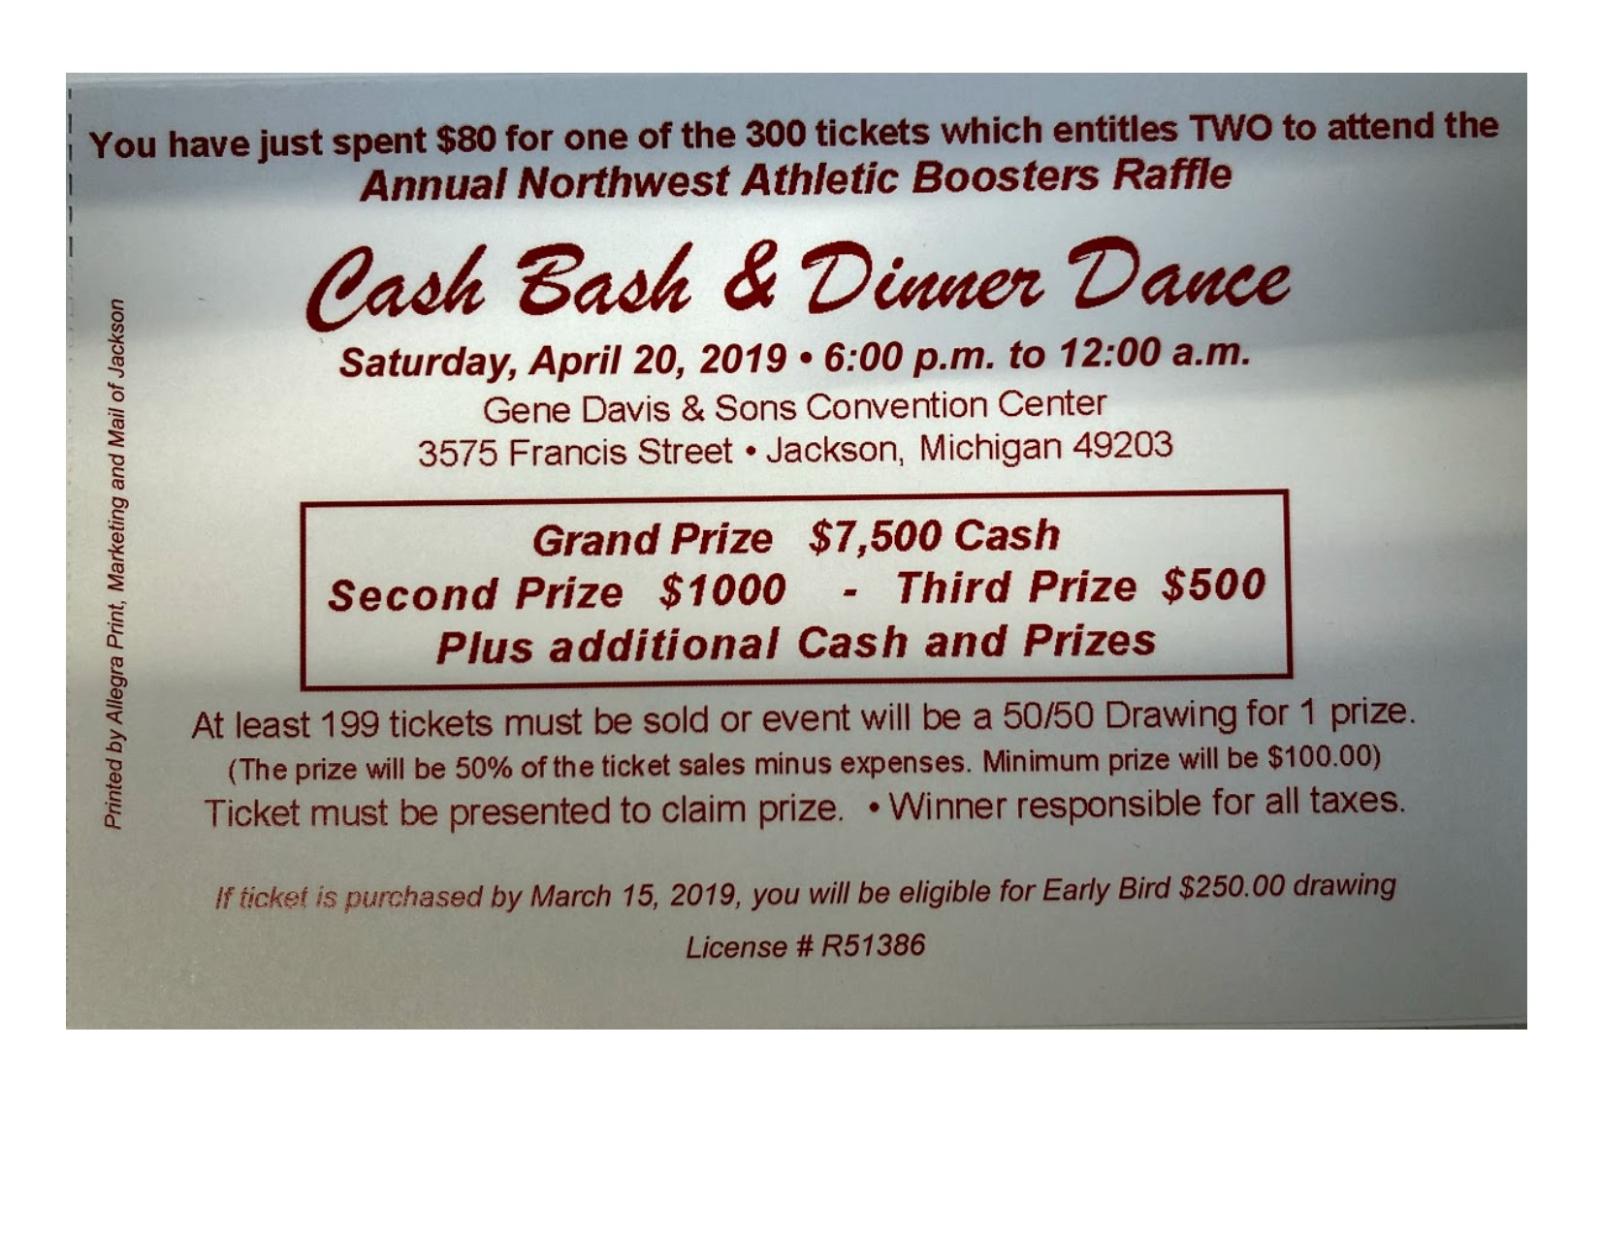 NW Cash Bash – Early Bird Drawing Deadline